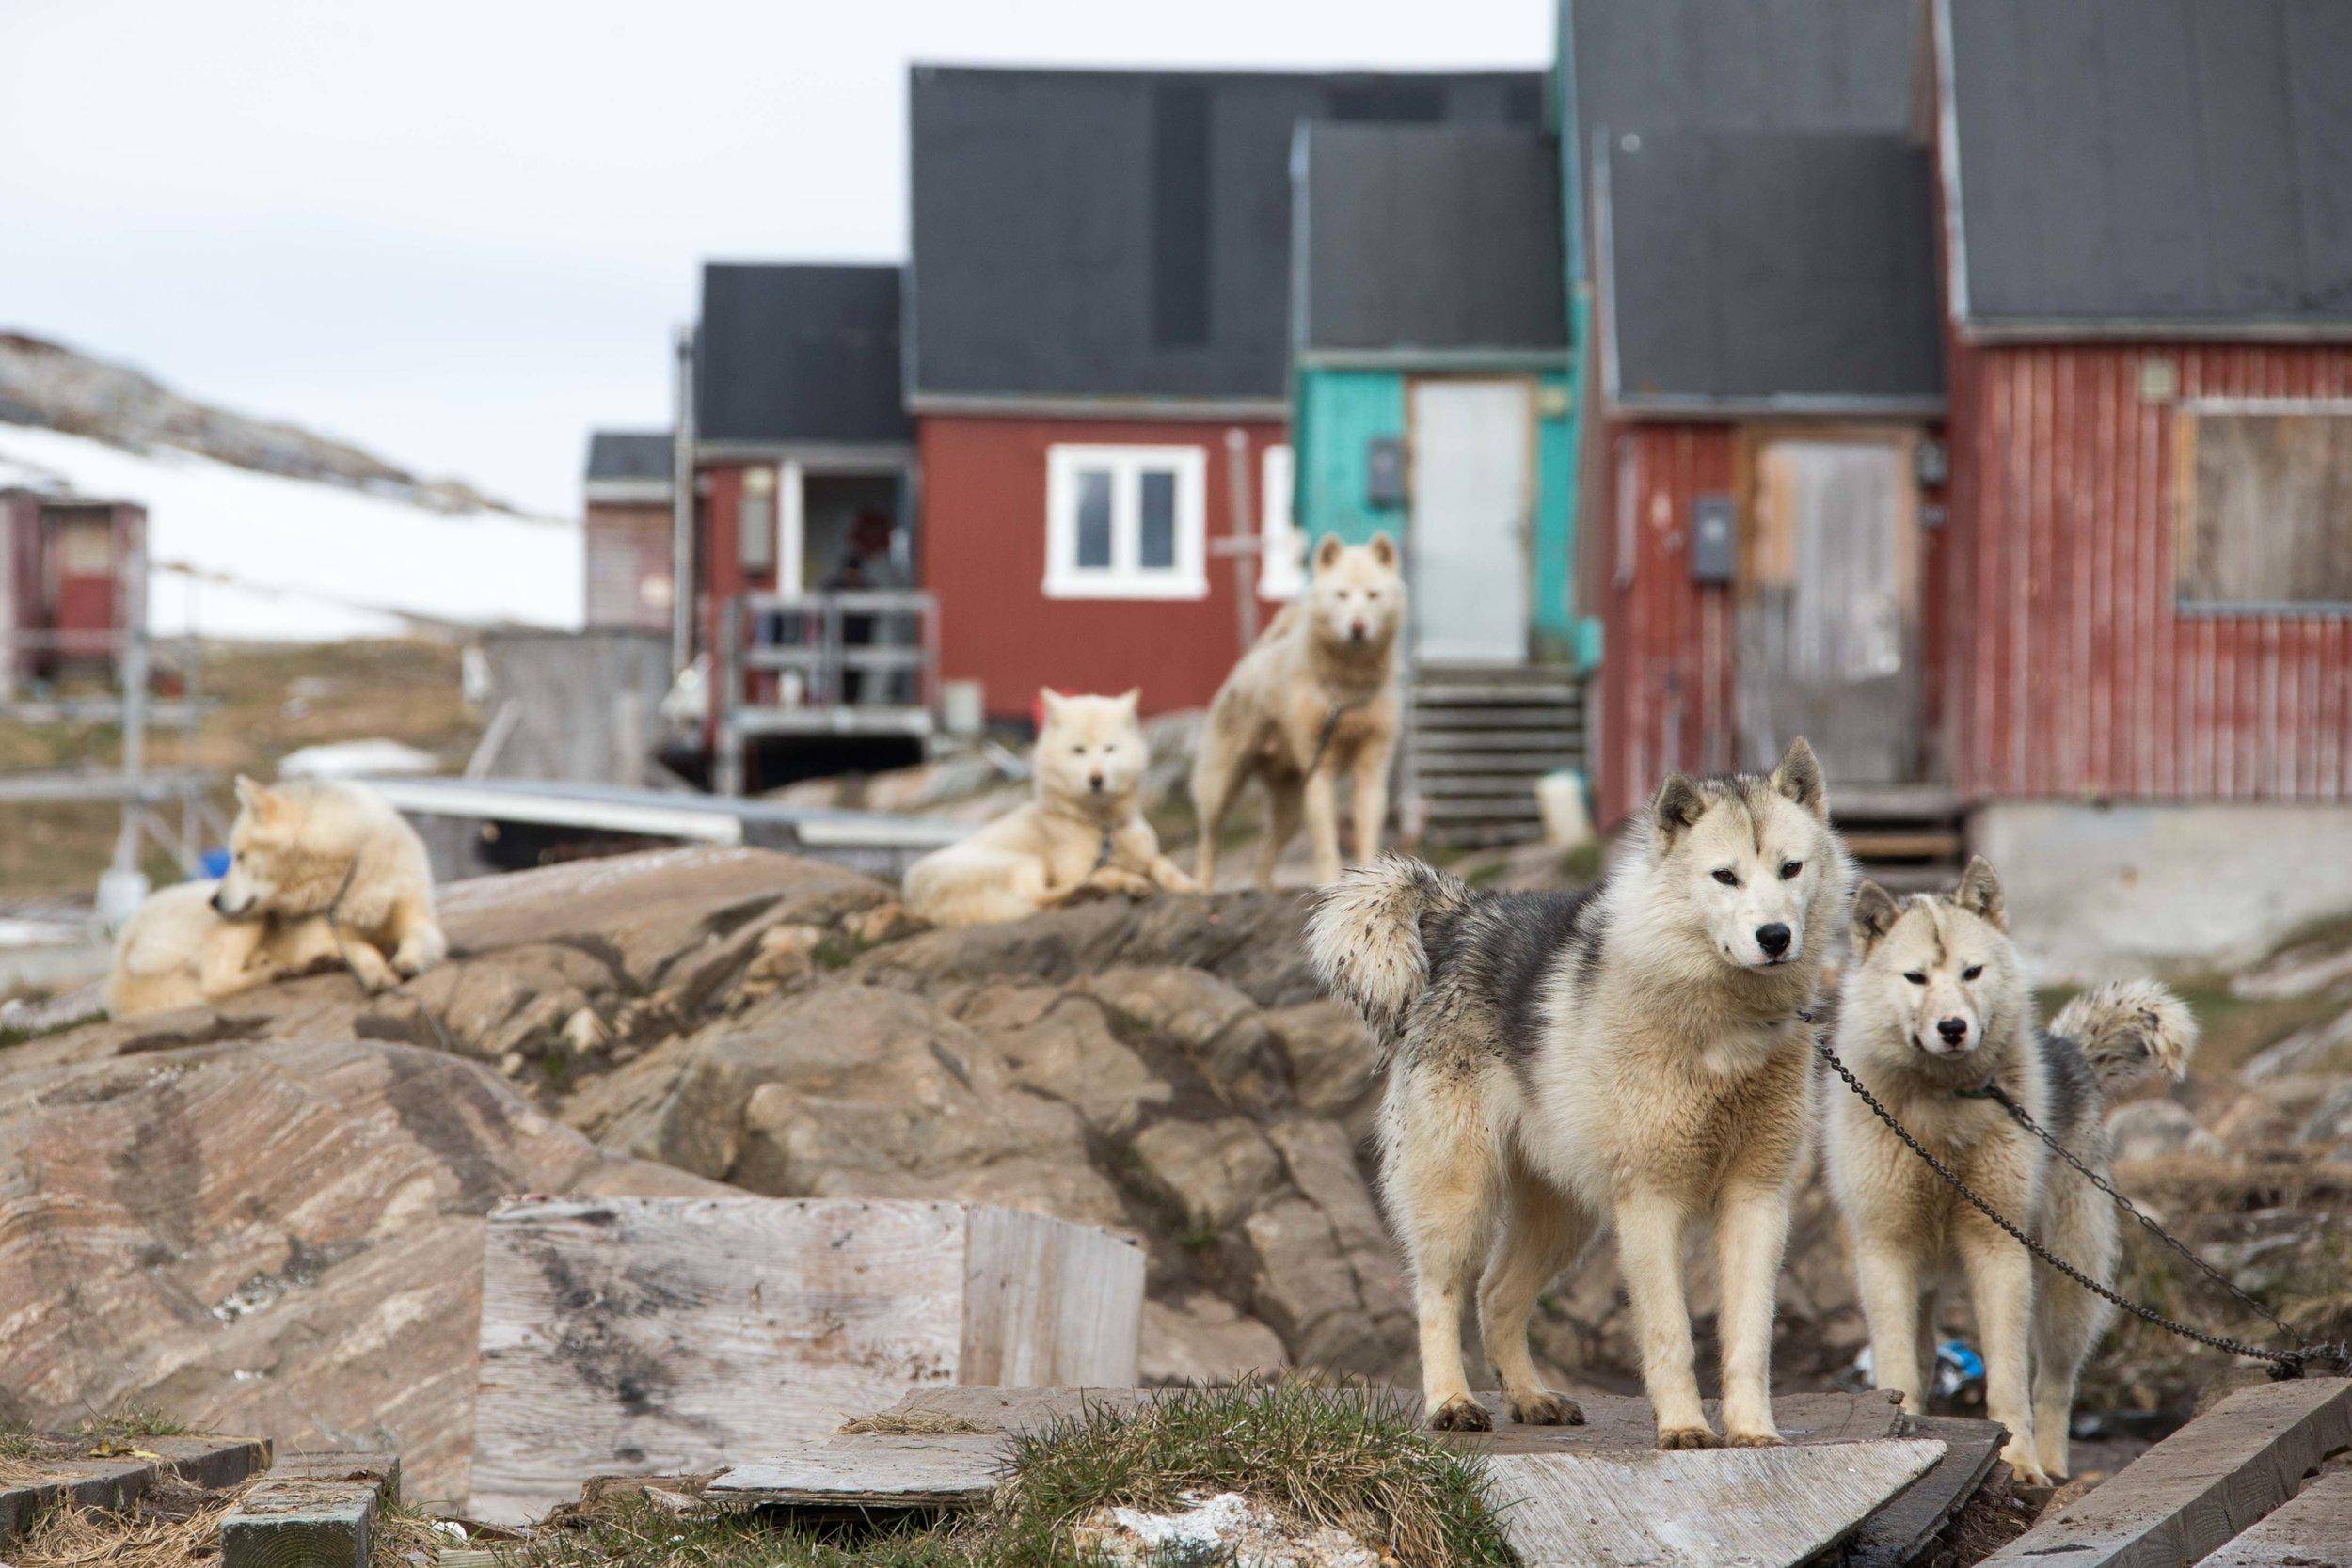 Sled dogs in the settlement of Kuummiit, East Greenland. Photo: Matt Reichel